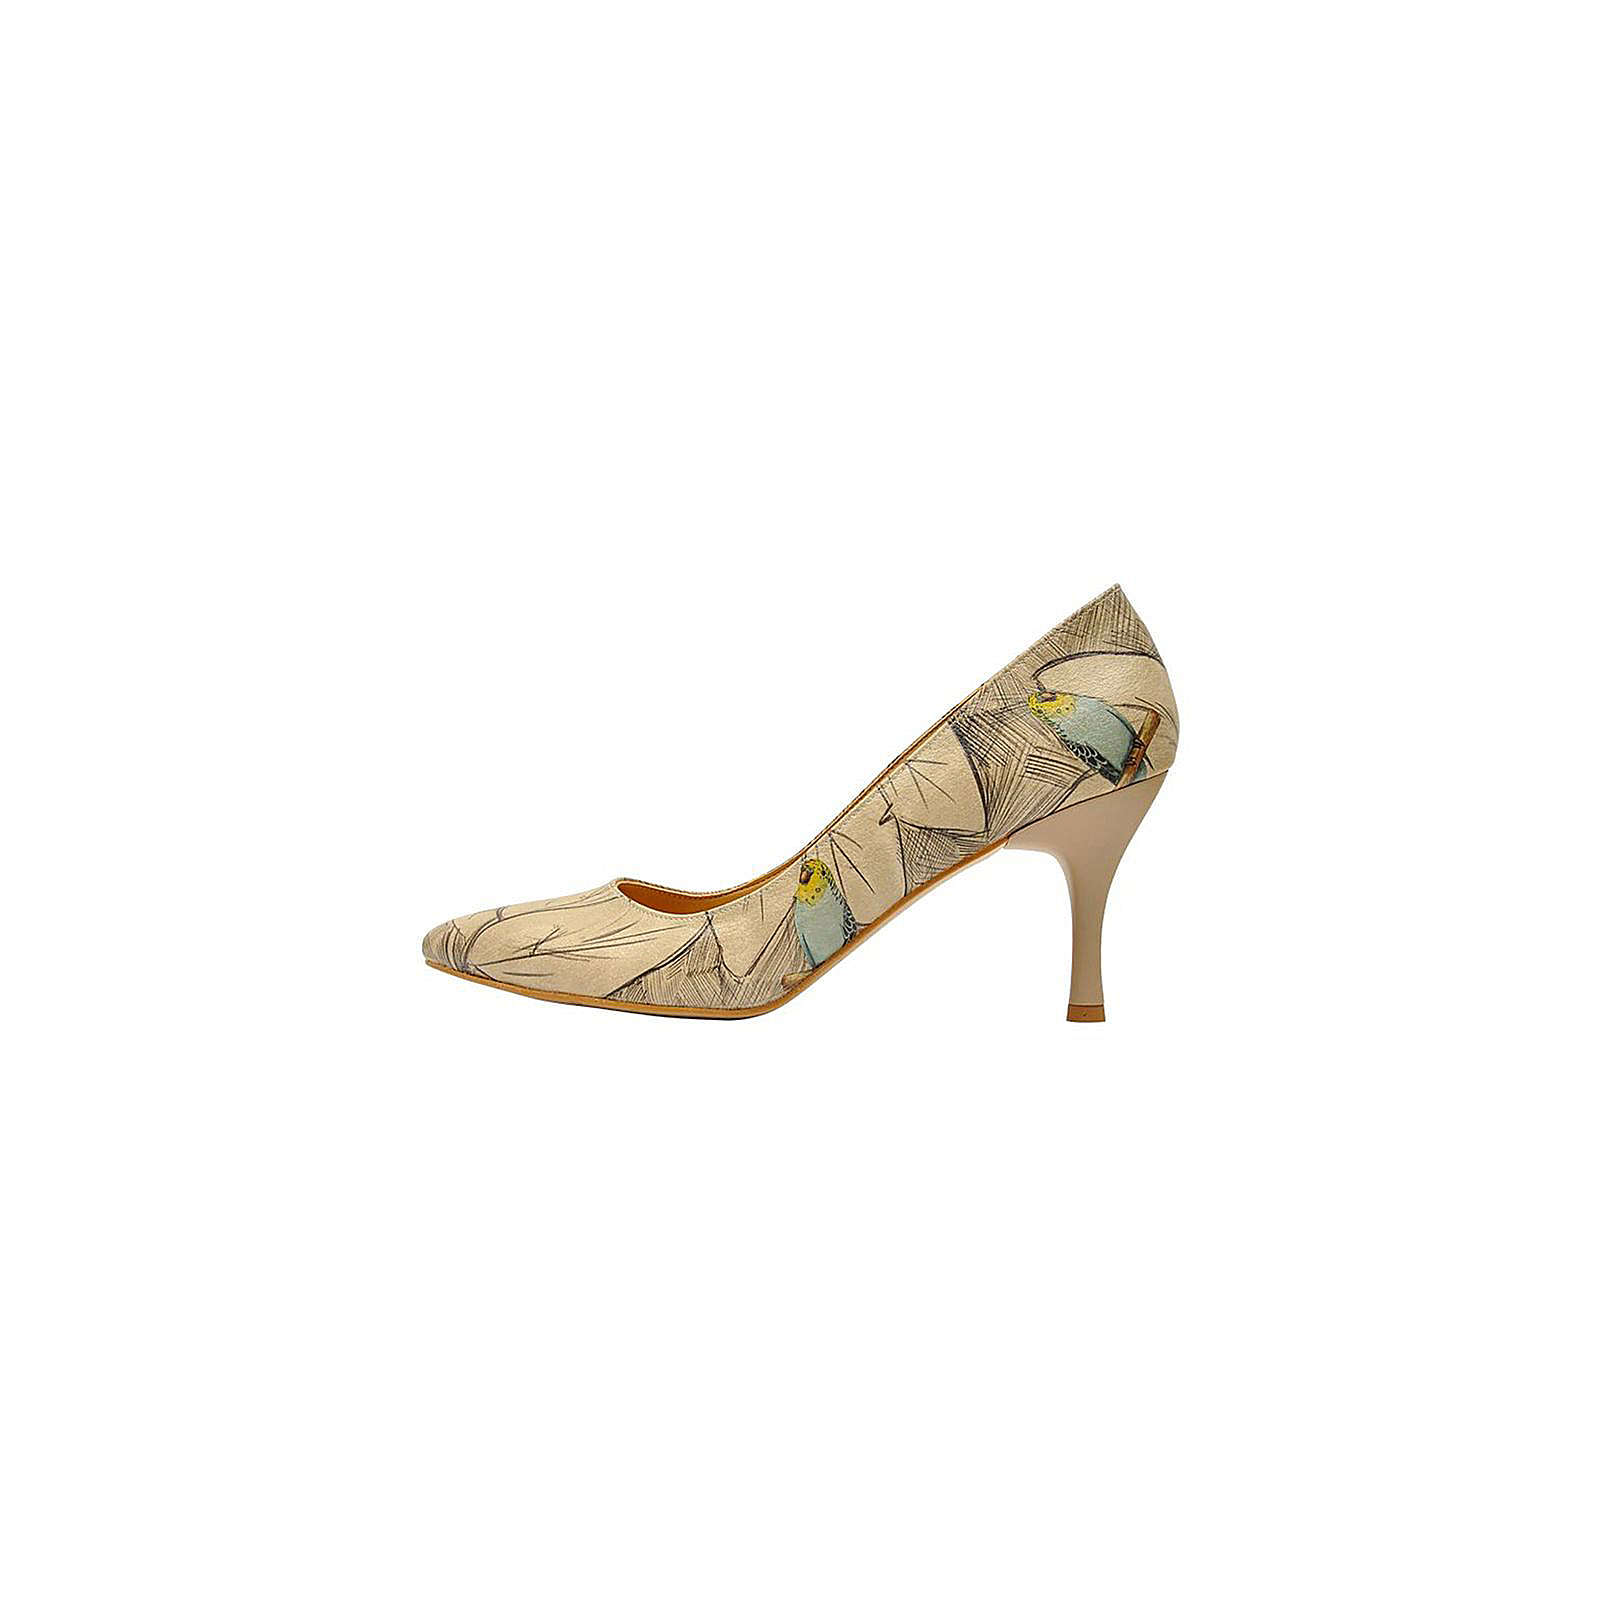 Dogo Shoes Budgies are Cool Klassische Pumps mehrfarbig Damen Gr. 36